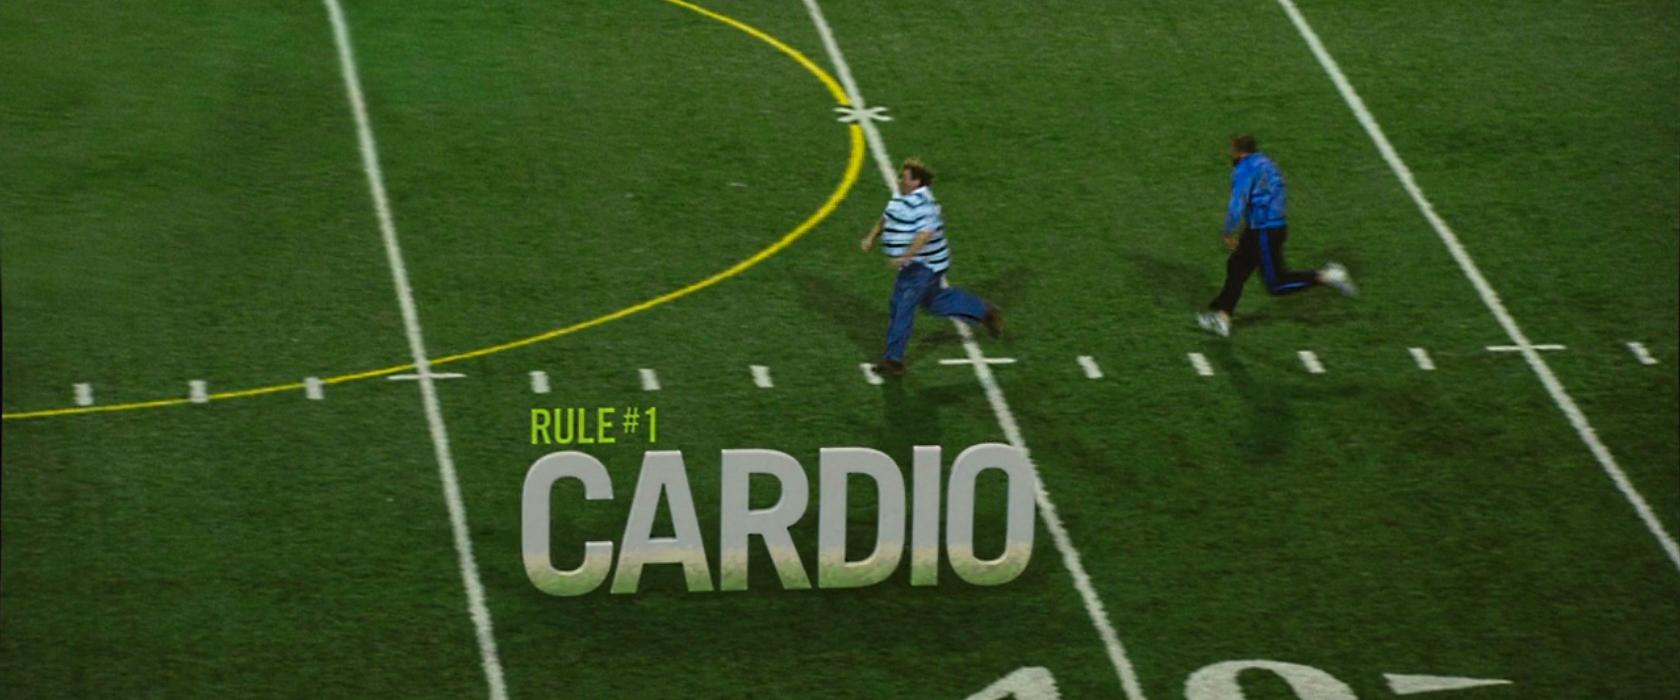 rule_1___cardio_by_bubimandril.jpg